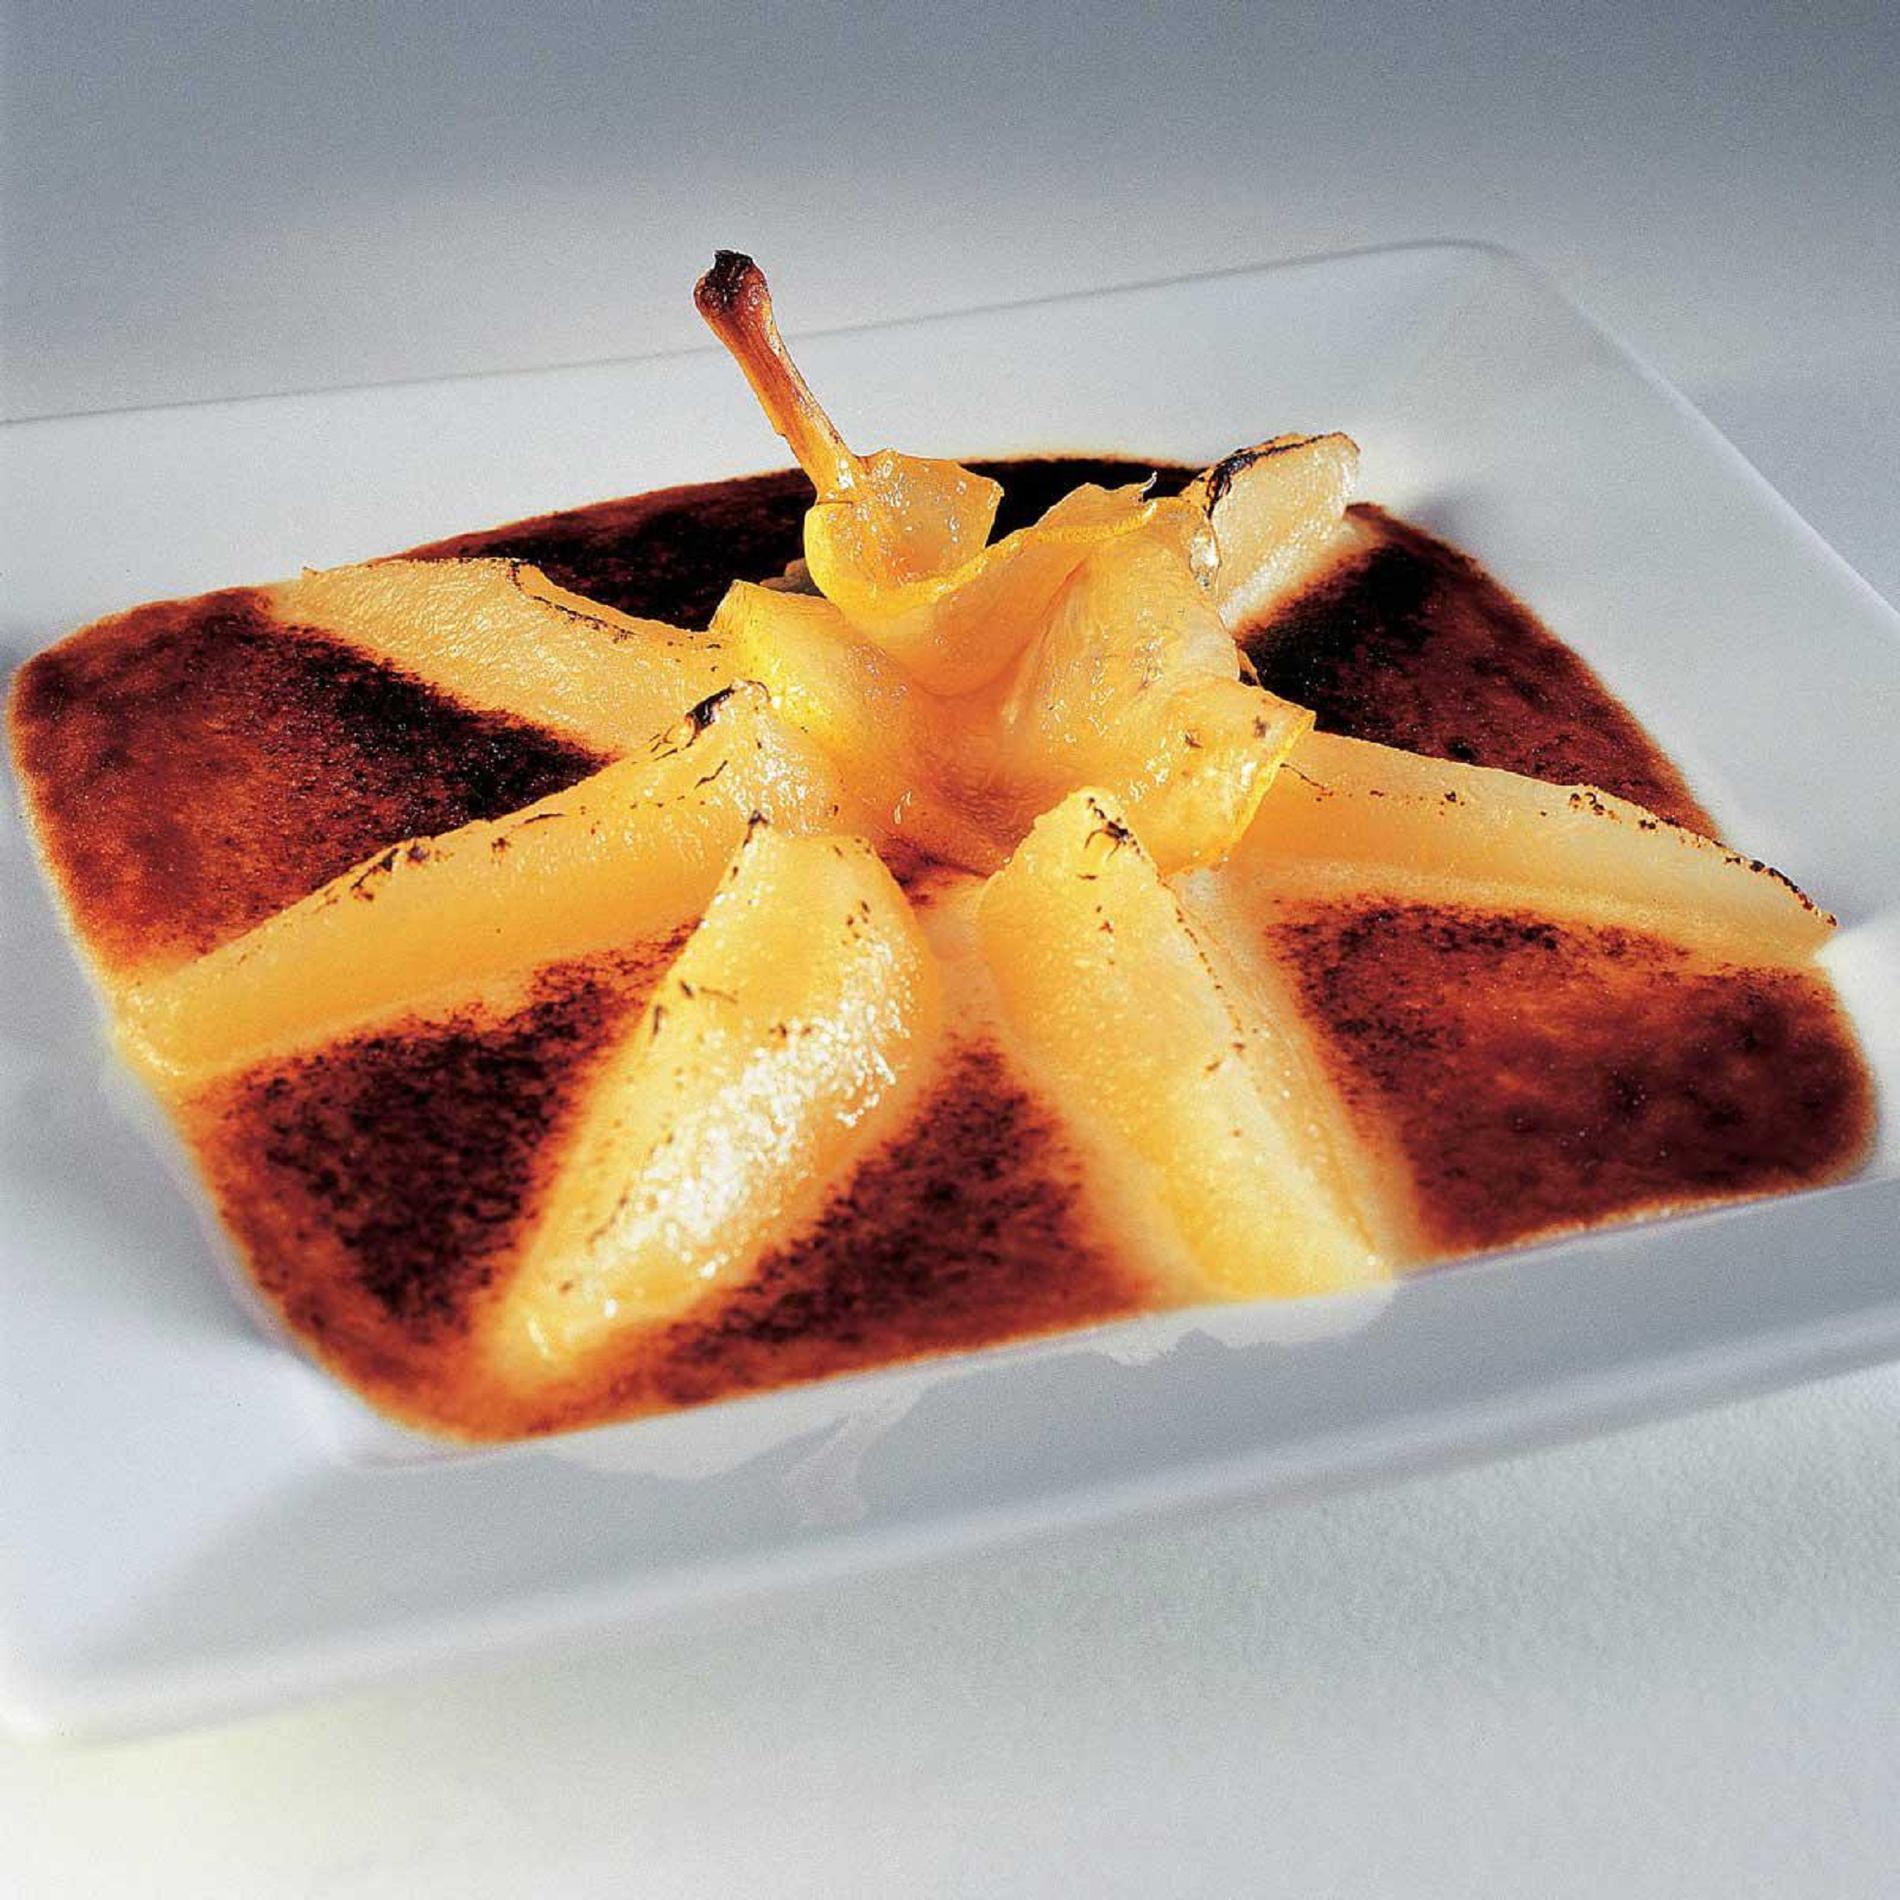 recette amandine aux poires cuisine madame figaro. Black Bedroom Furniture Sets. Home Design Ideas